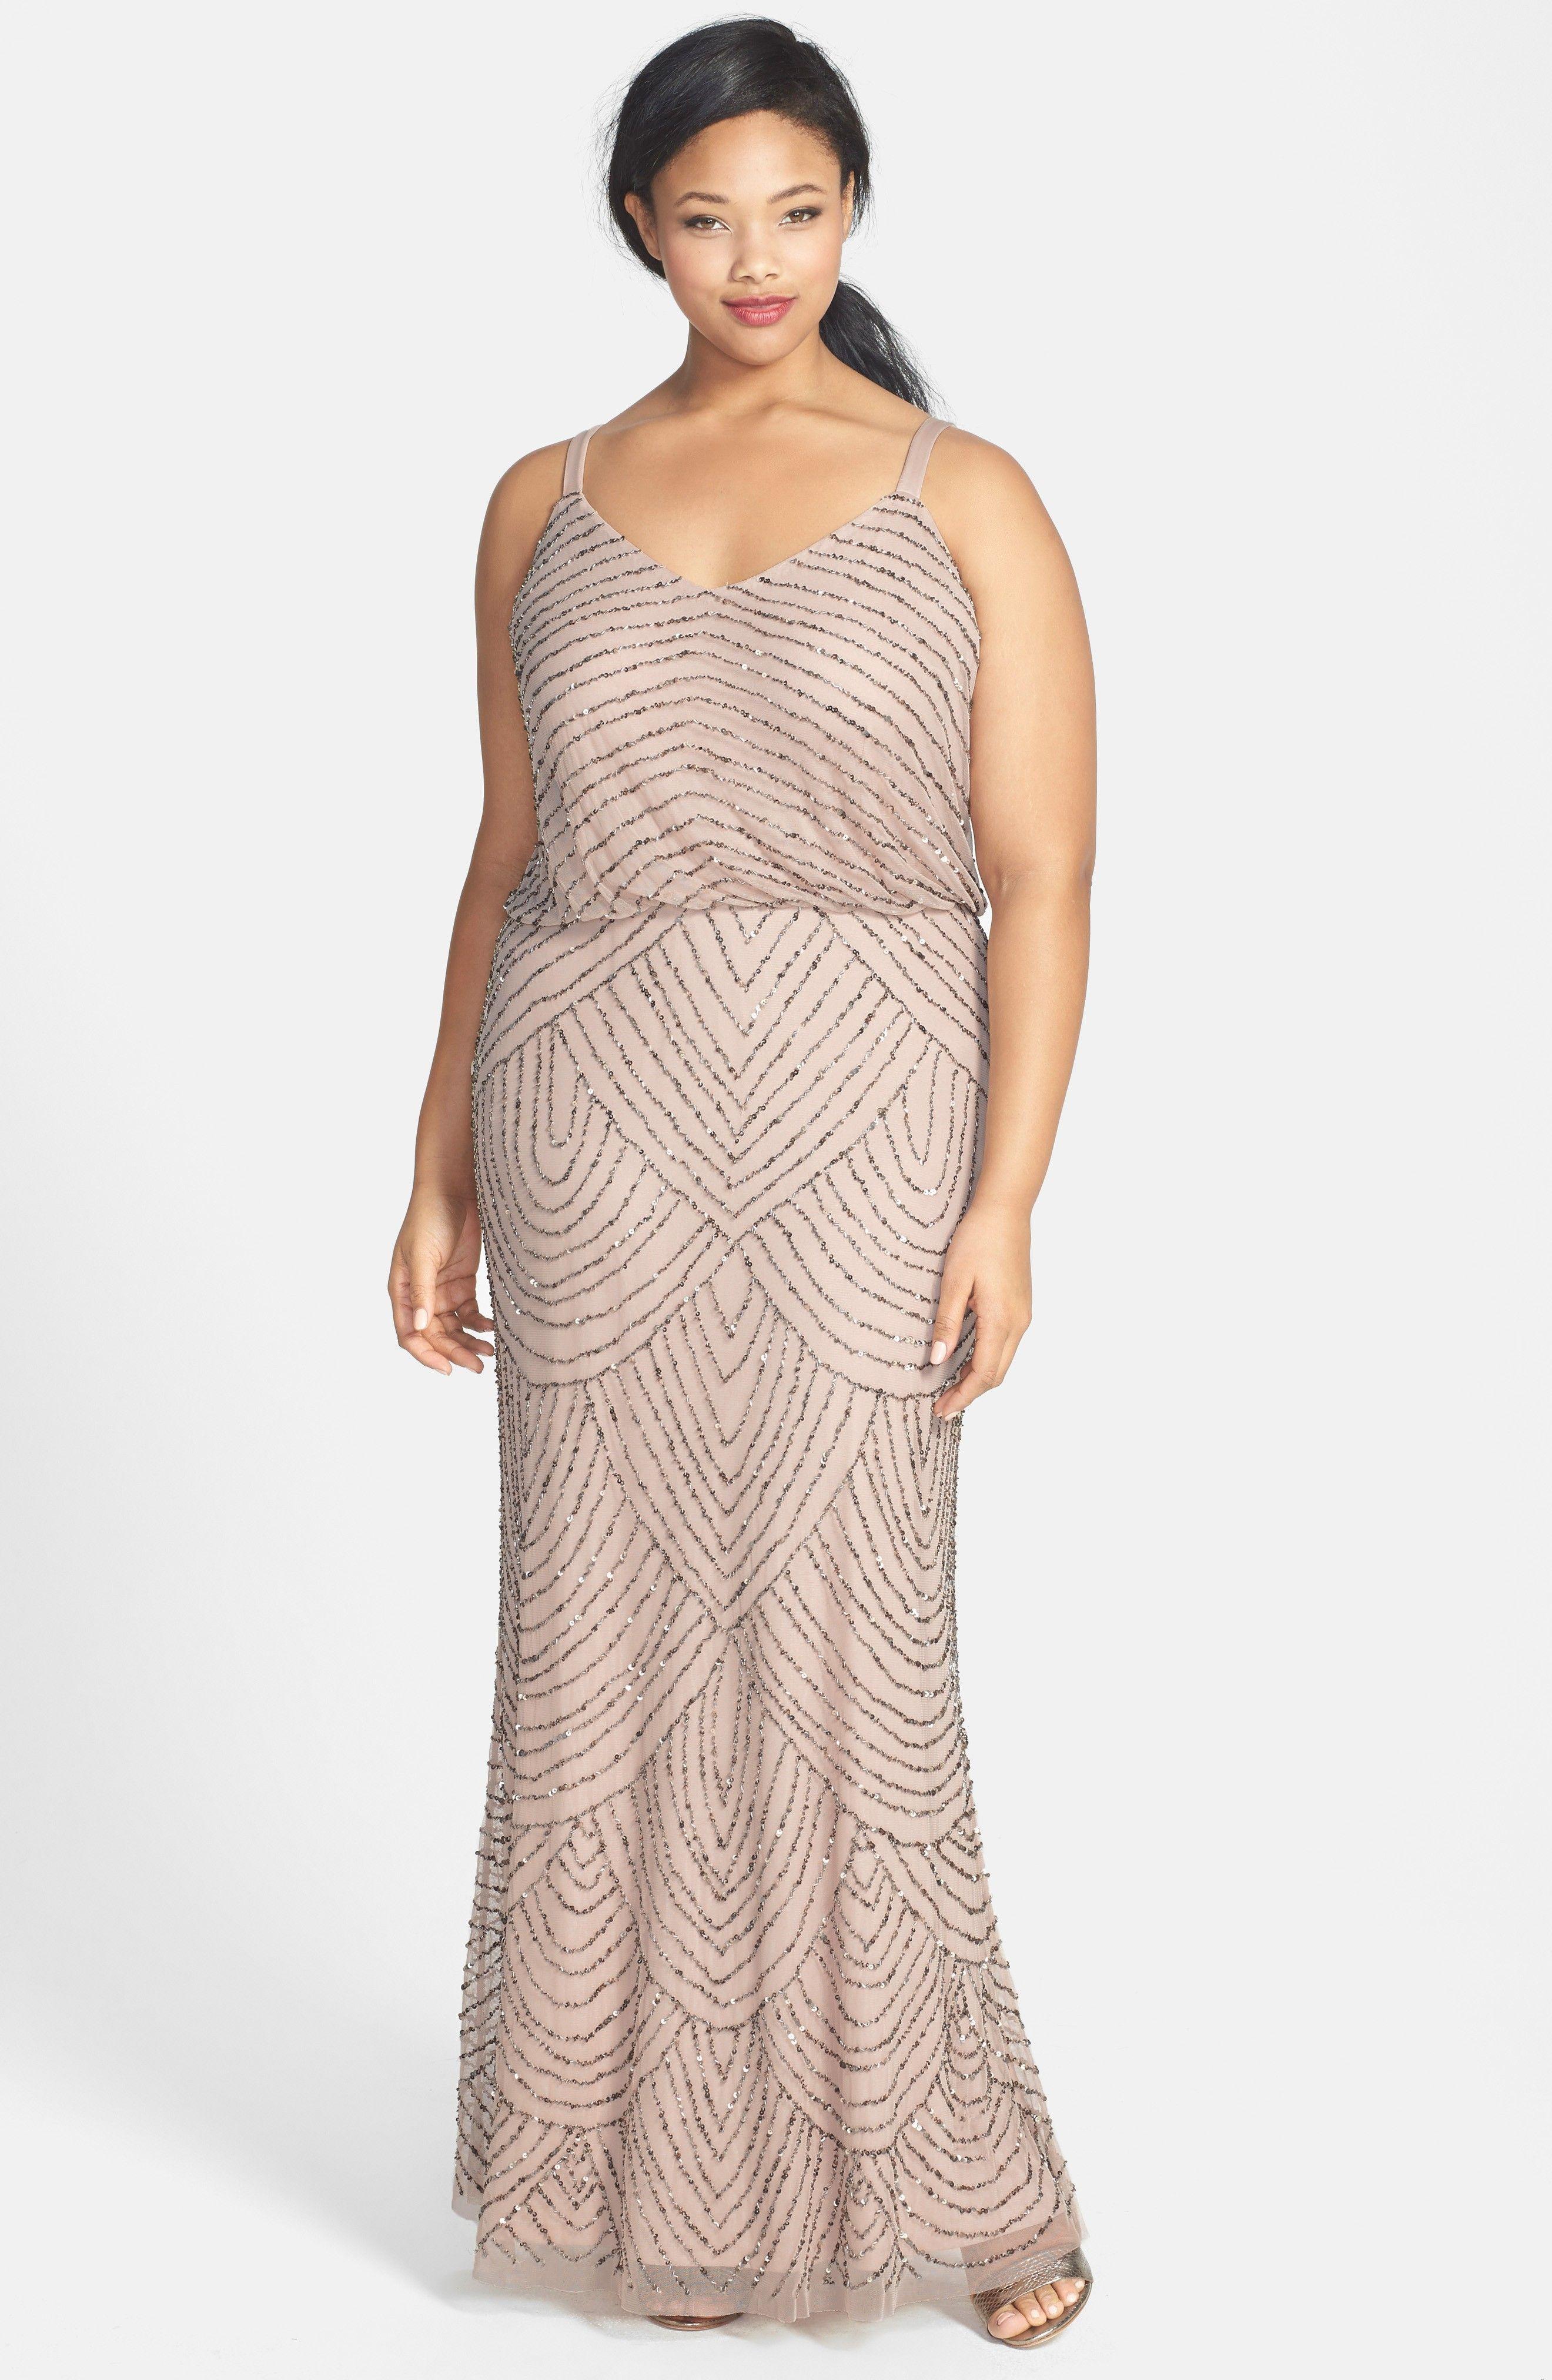 Blush Beaded Long Adrianna Papell Bridesmaid Dress - Beaded Blouson ...